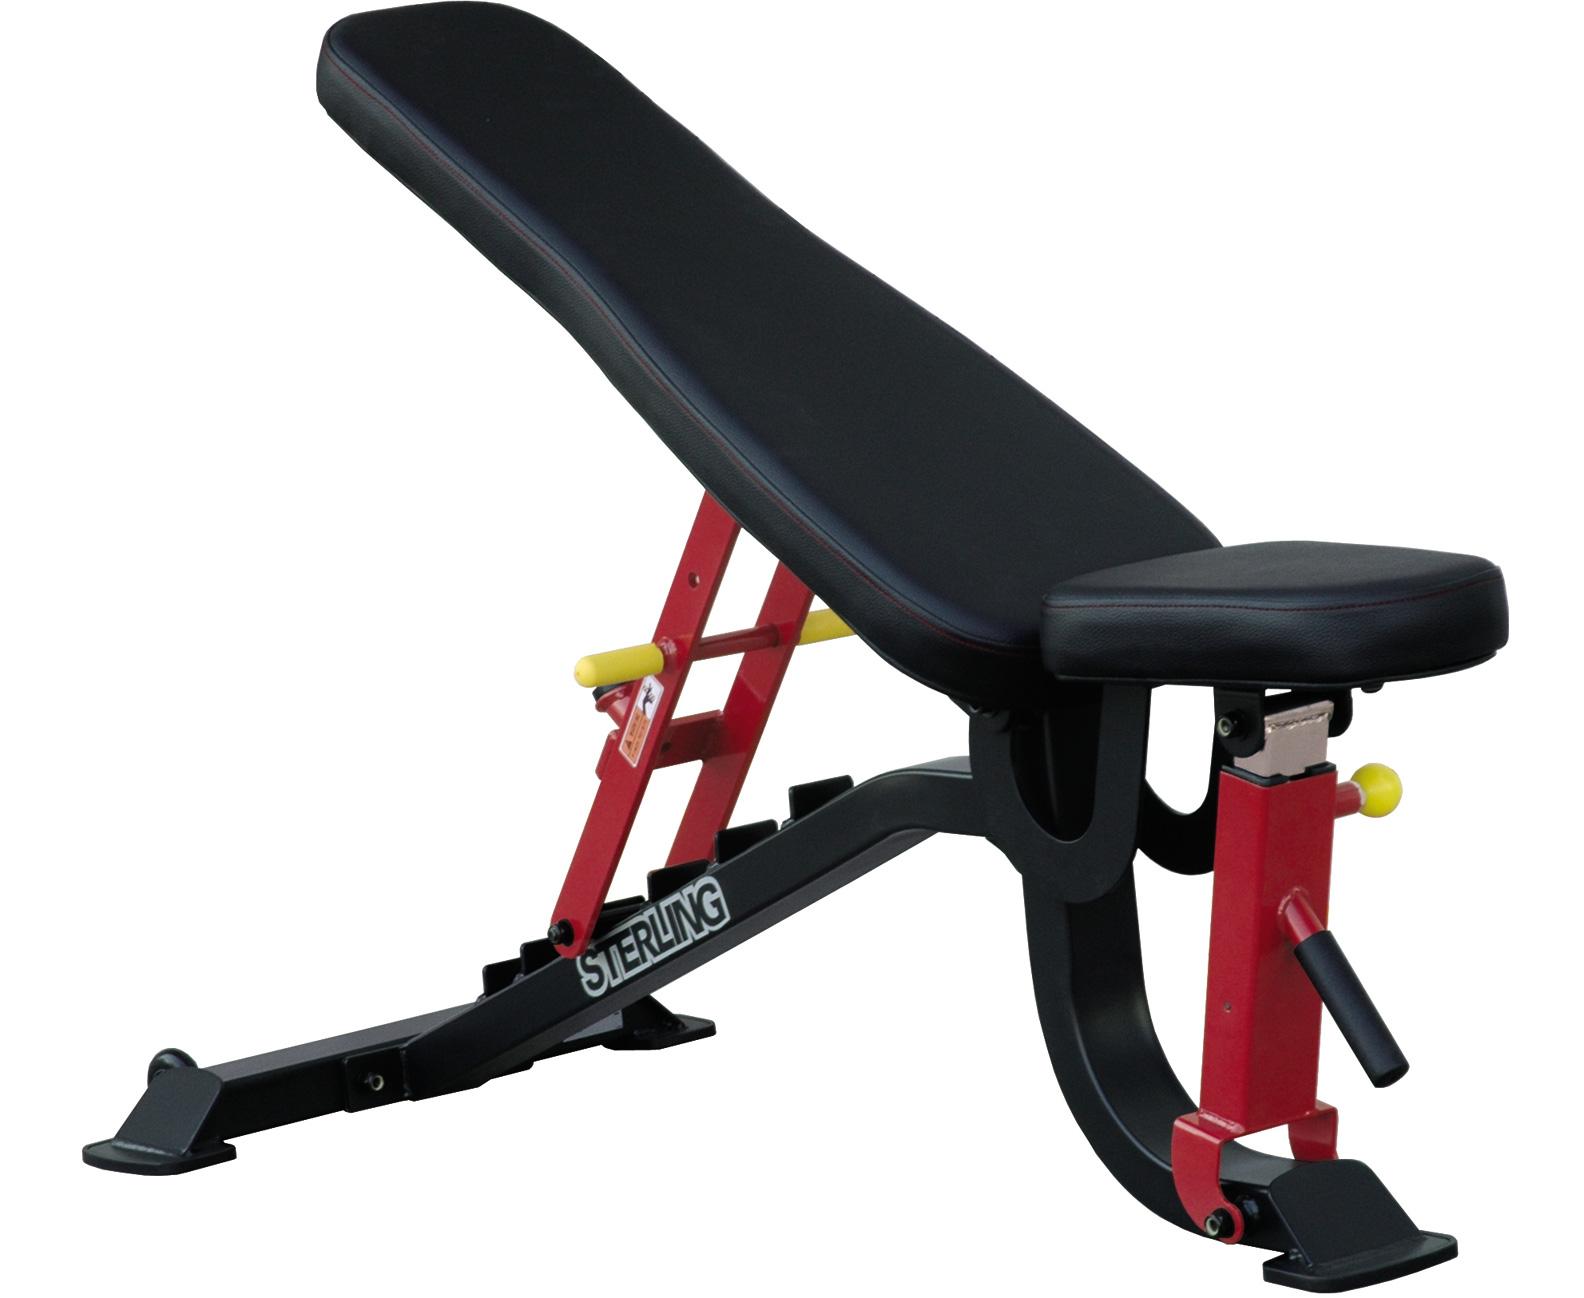 Banca exercitii reglabila, profesionala, SL 7011, Impulse Fitness